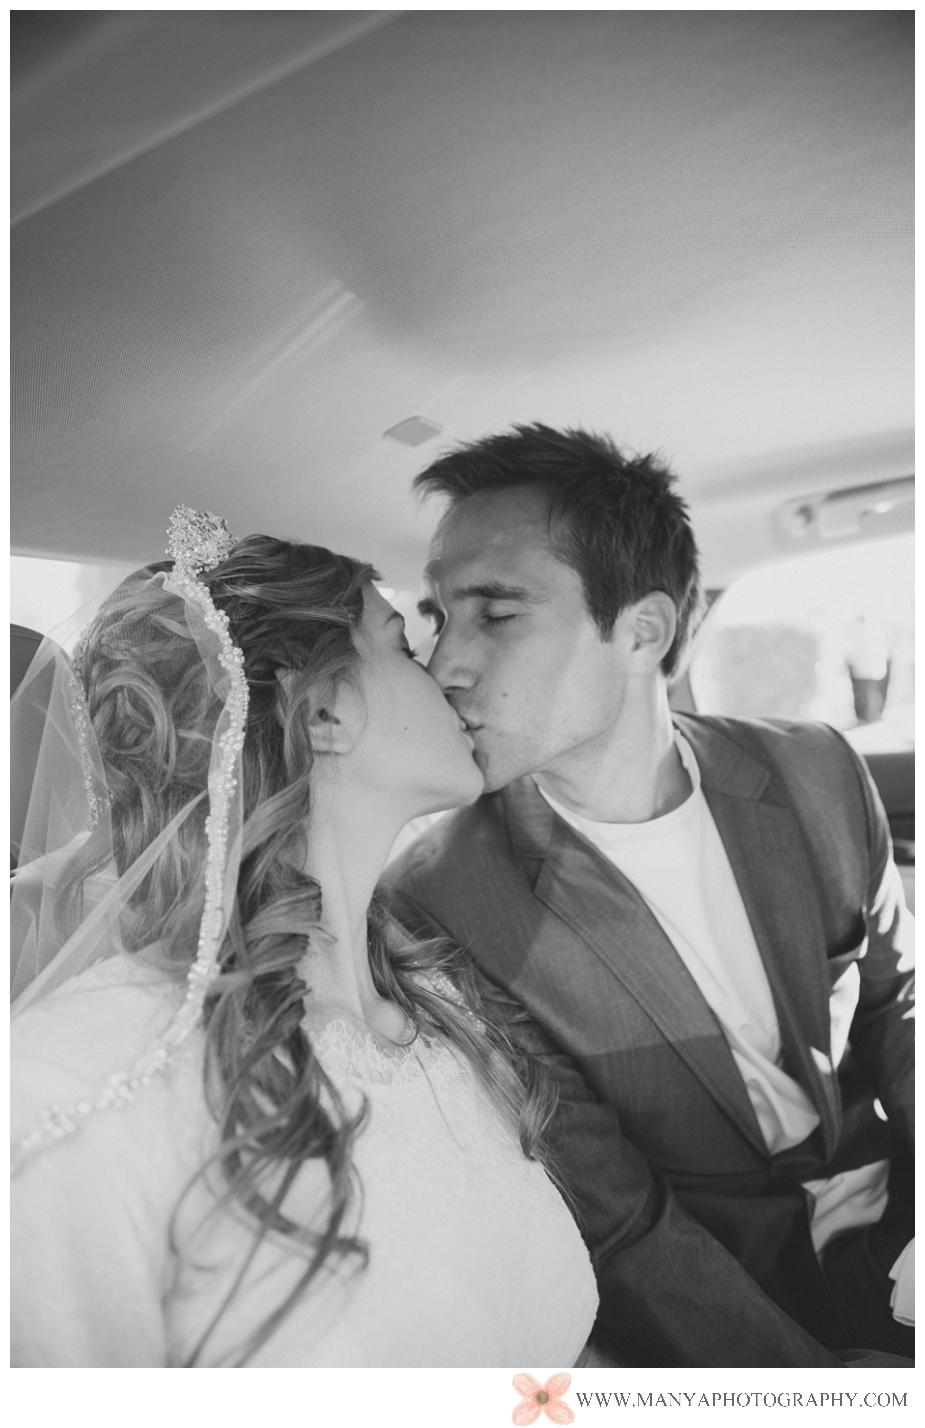 2013-07-23_0019 - Orange County Wedding Photographer